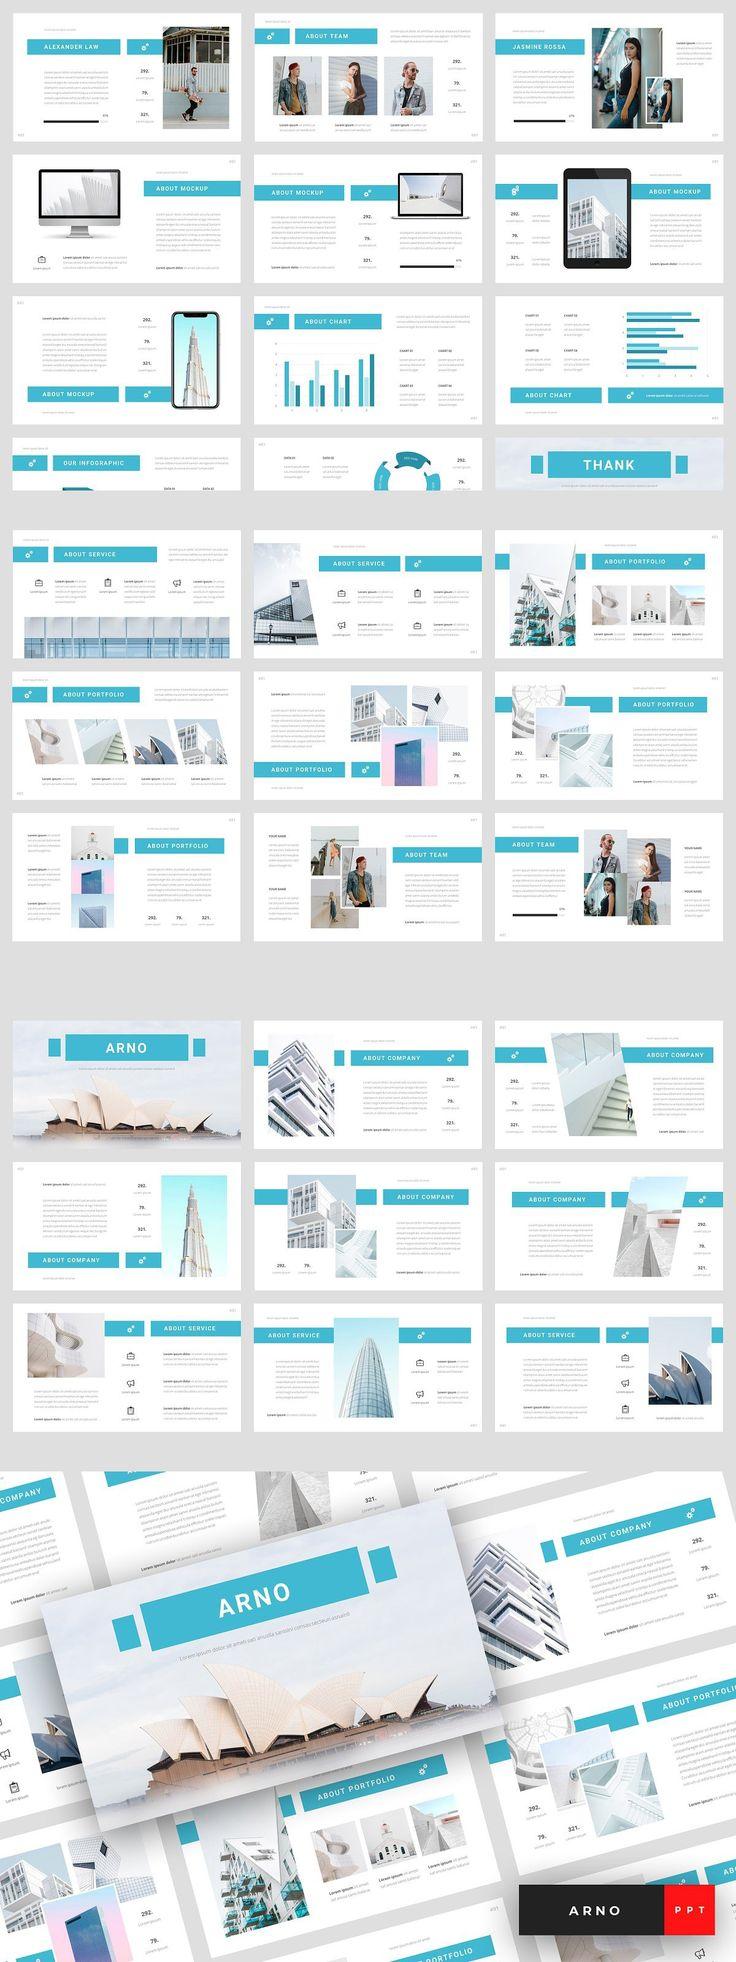 Arno Architecture PowerPoint Architecture, Creative